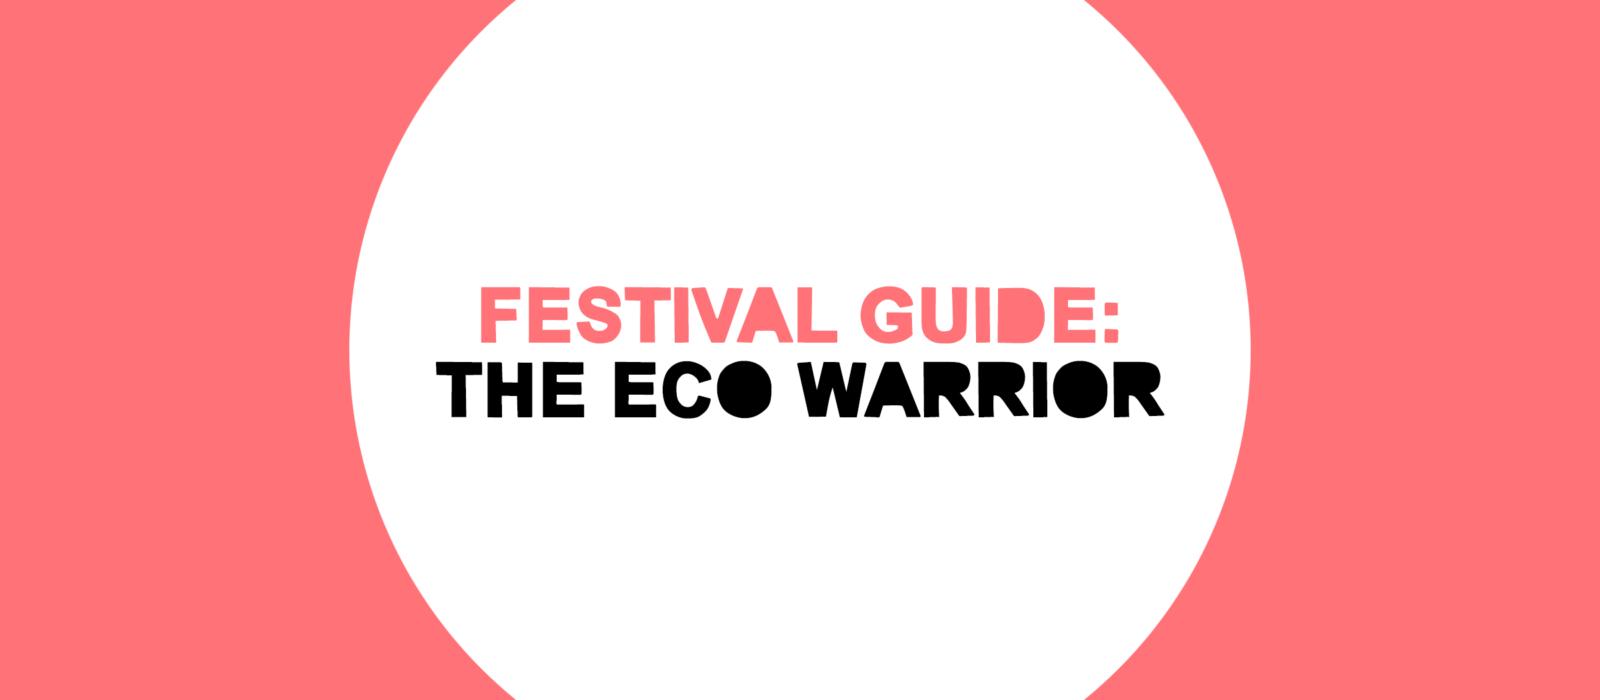 DESIGN Canberra Festival Guide: The Eco Warrior